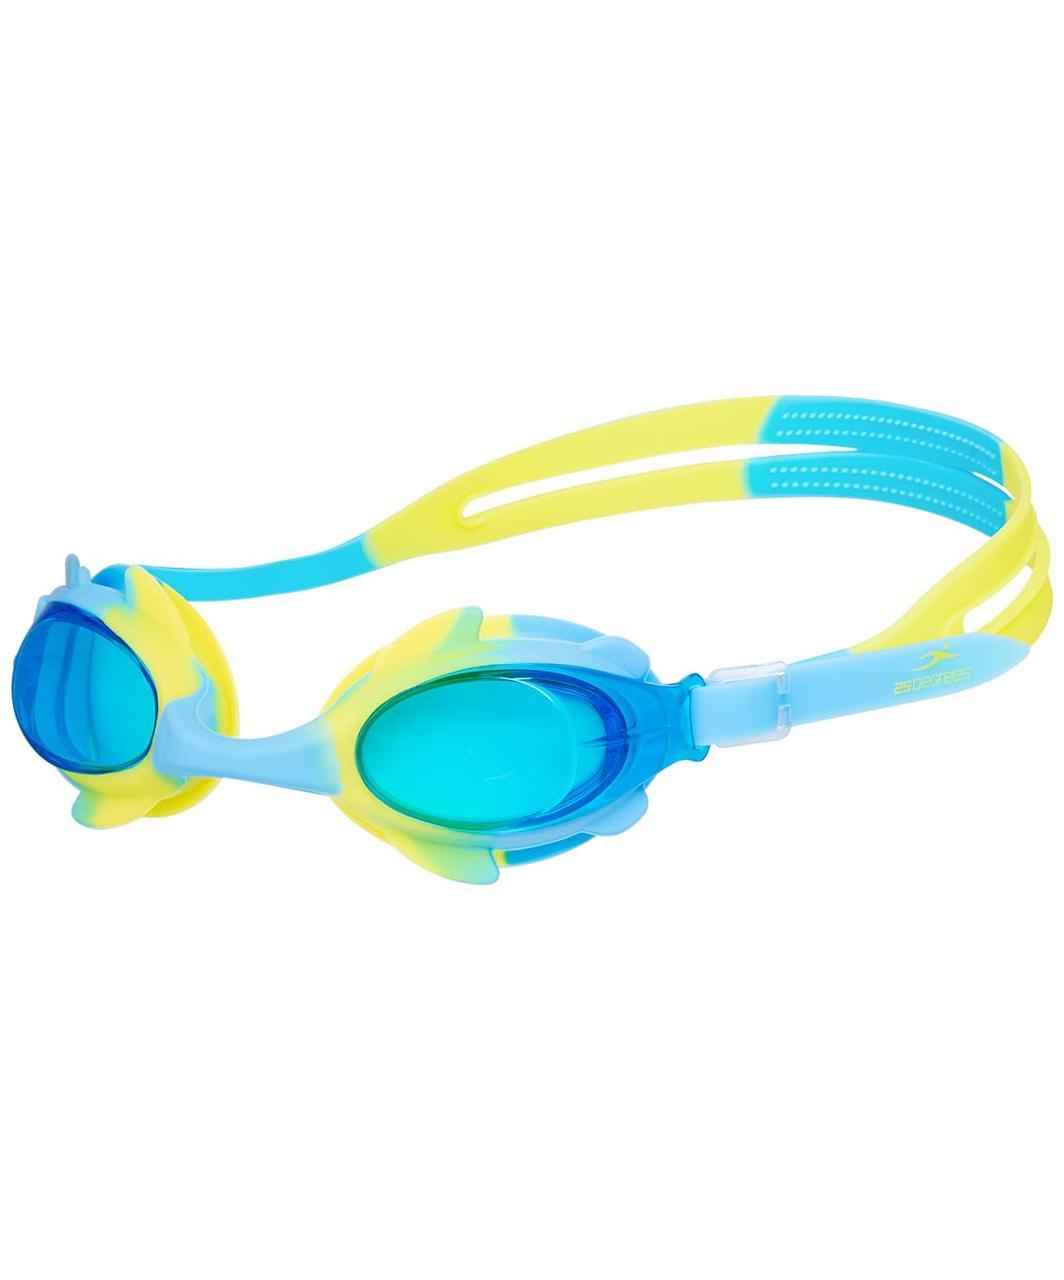 Очки для плавания Yunga Light Blue/Yellow, детские 25Degrees